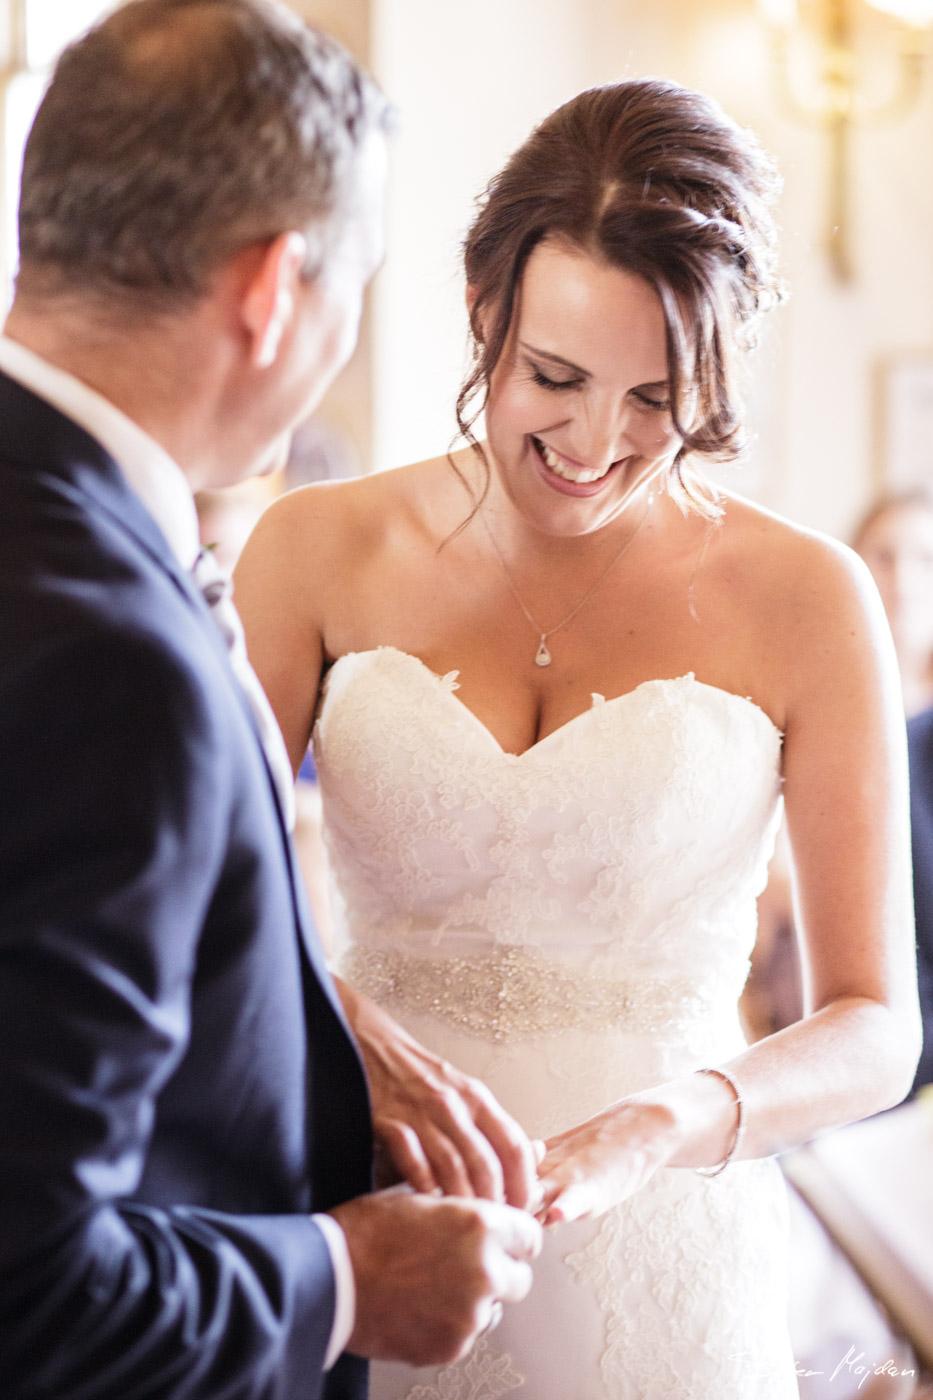 east-bridgford-hill-wedding-photography-32.jpg